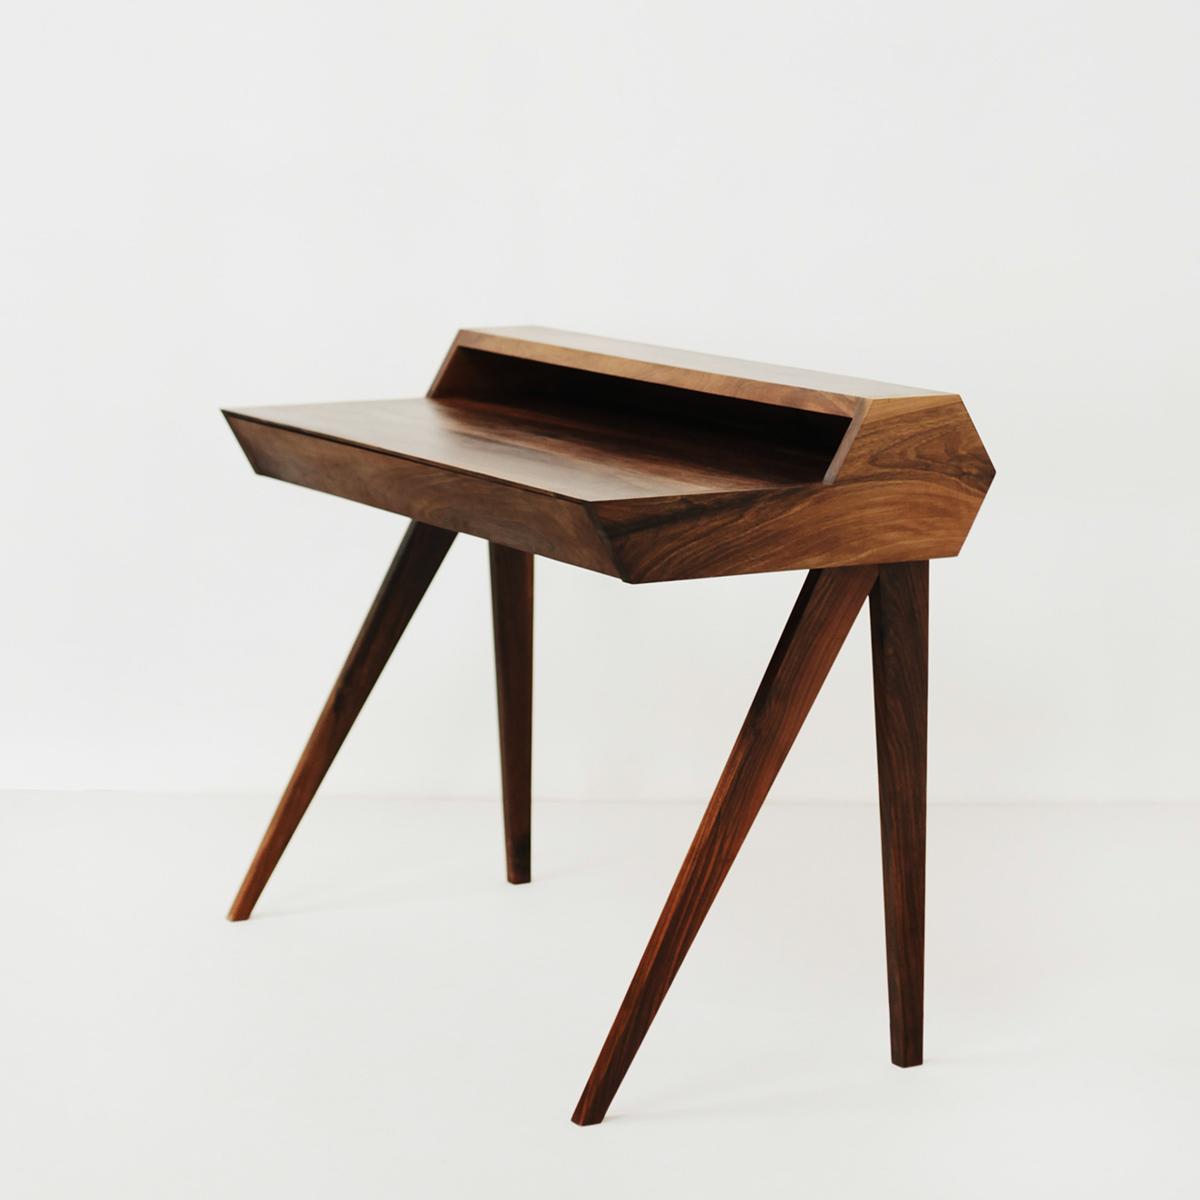 wood chair accessories swivel no wheels lampemm geometric furniture 2015